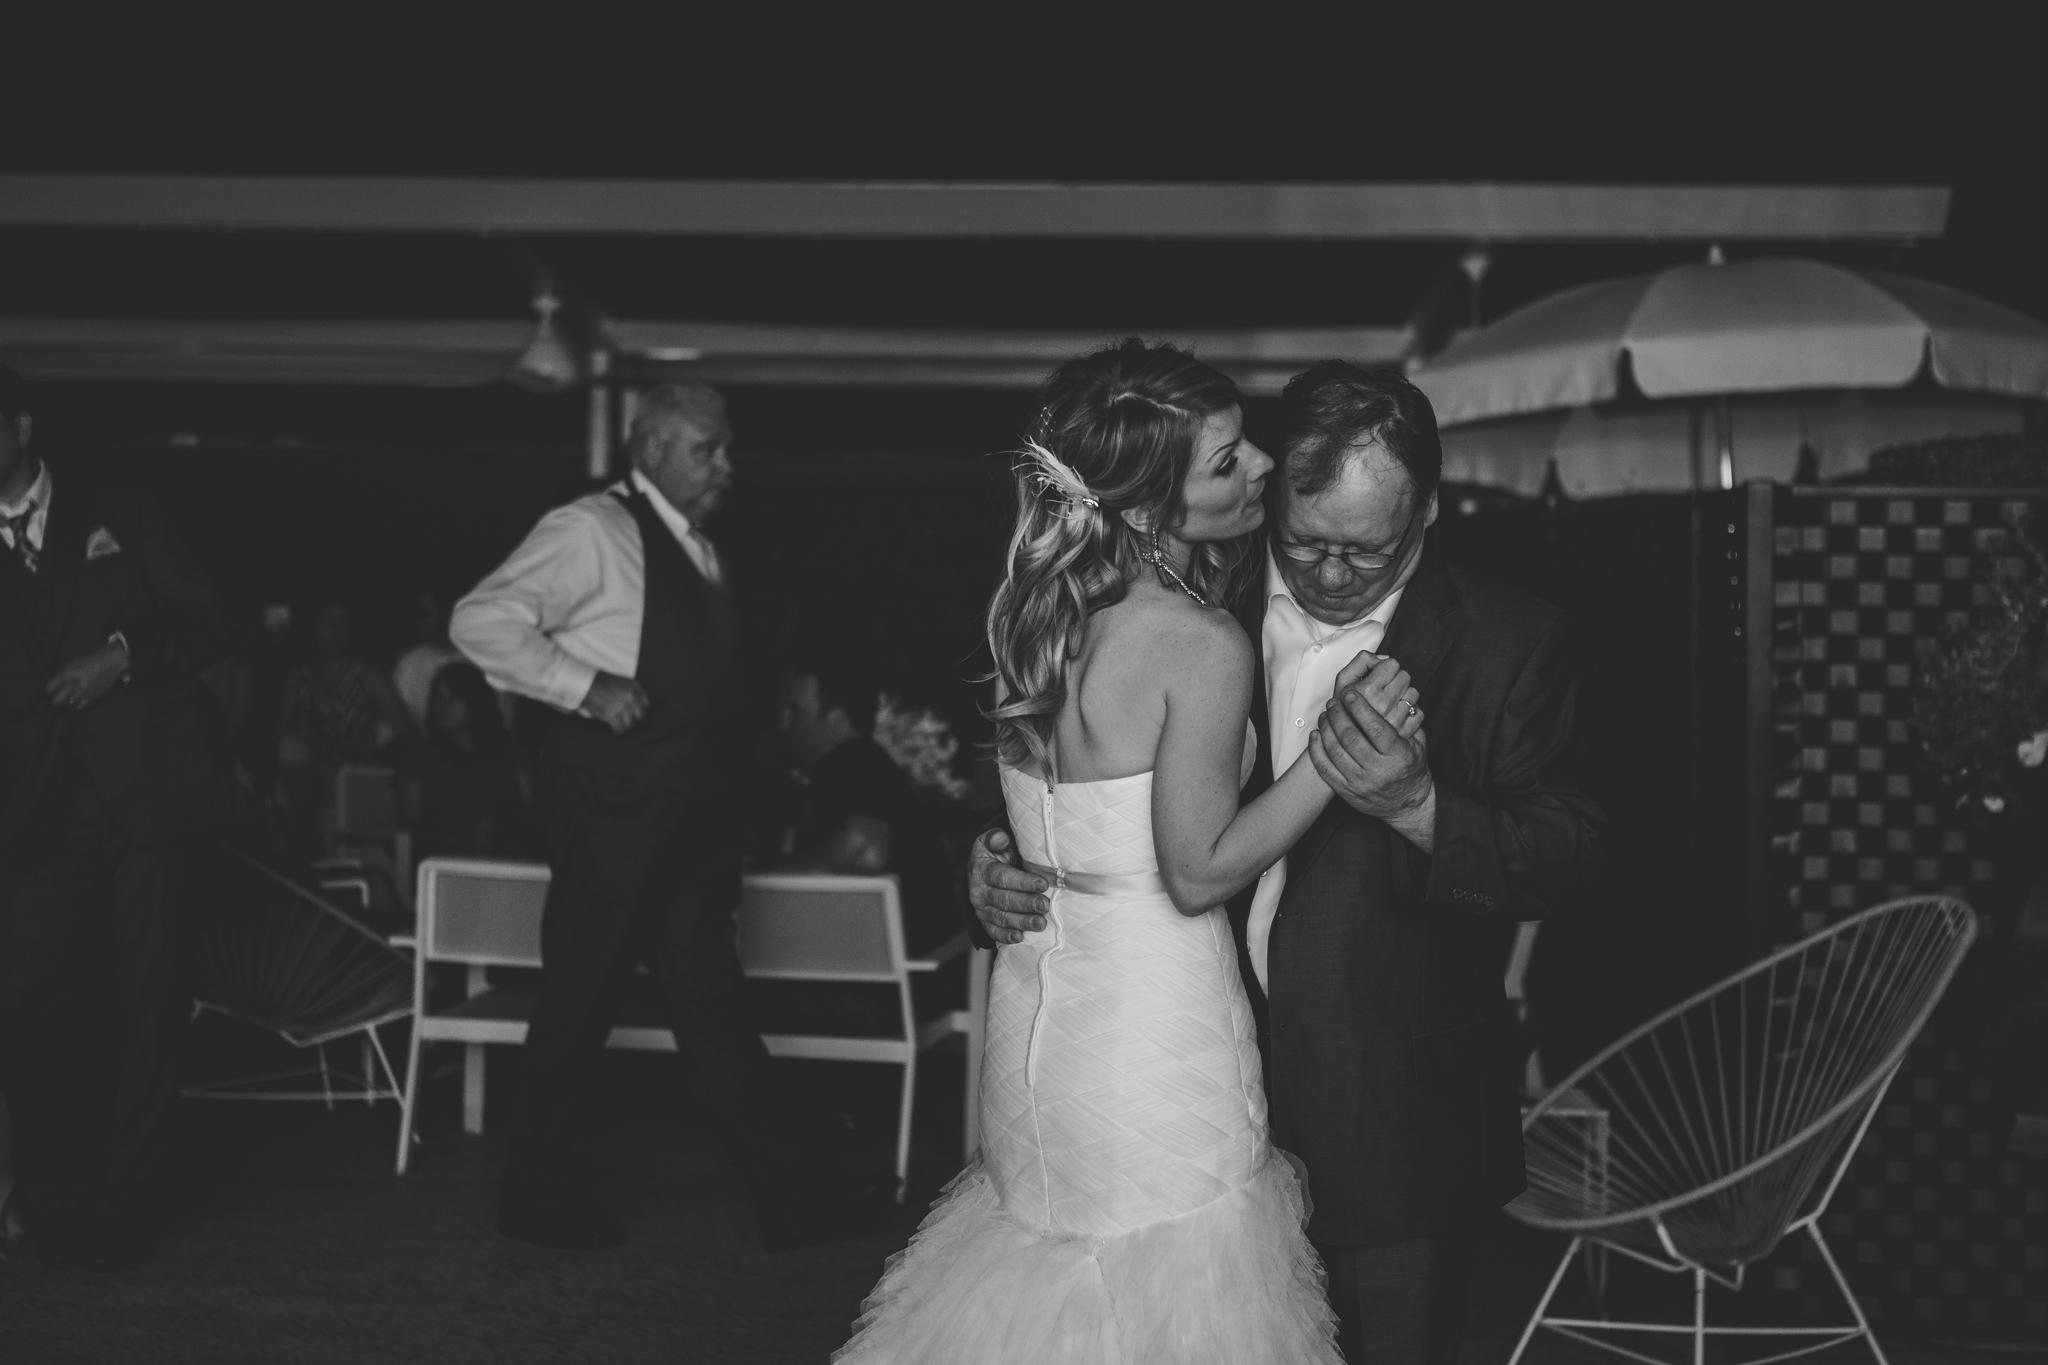 as-wedding-photography-el-dorado-scottsdale-daughter-father-dance-bw